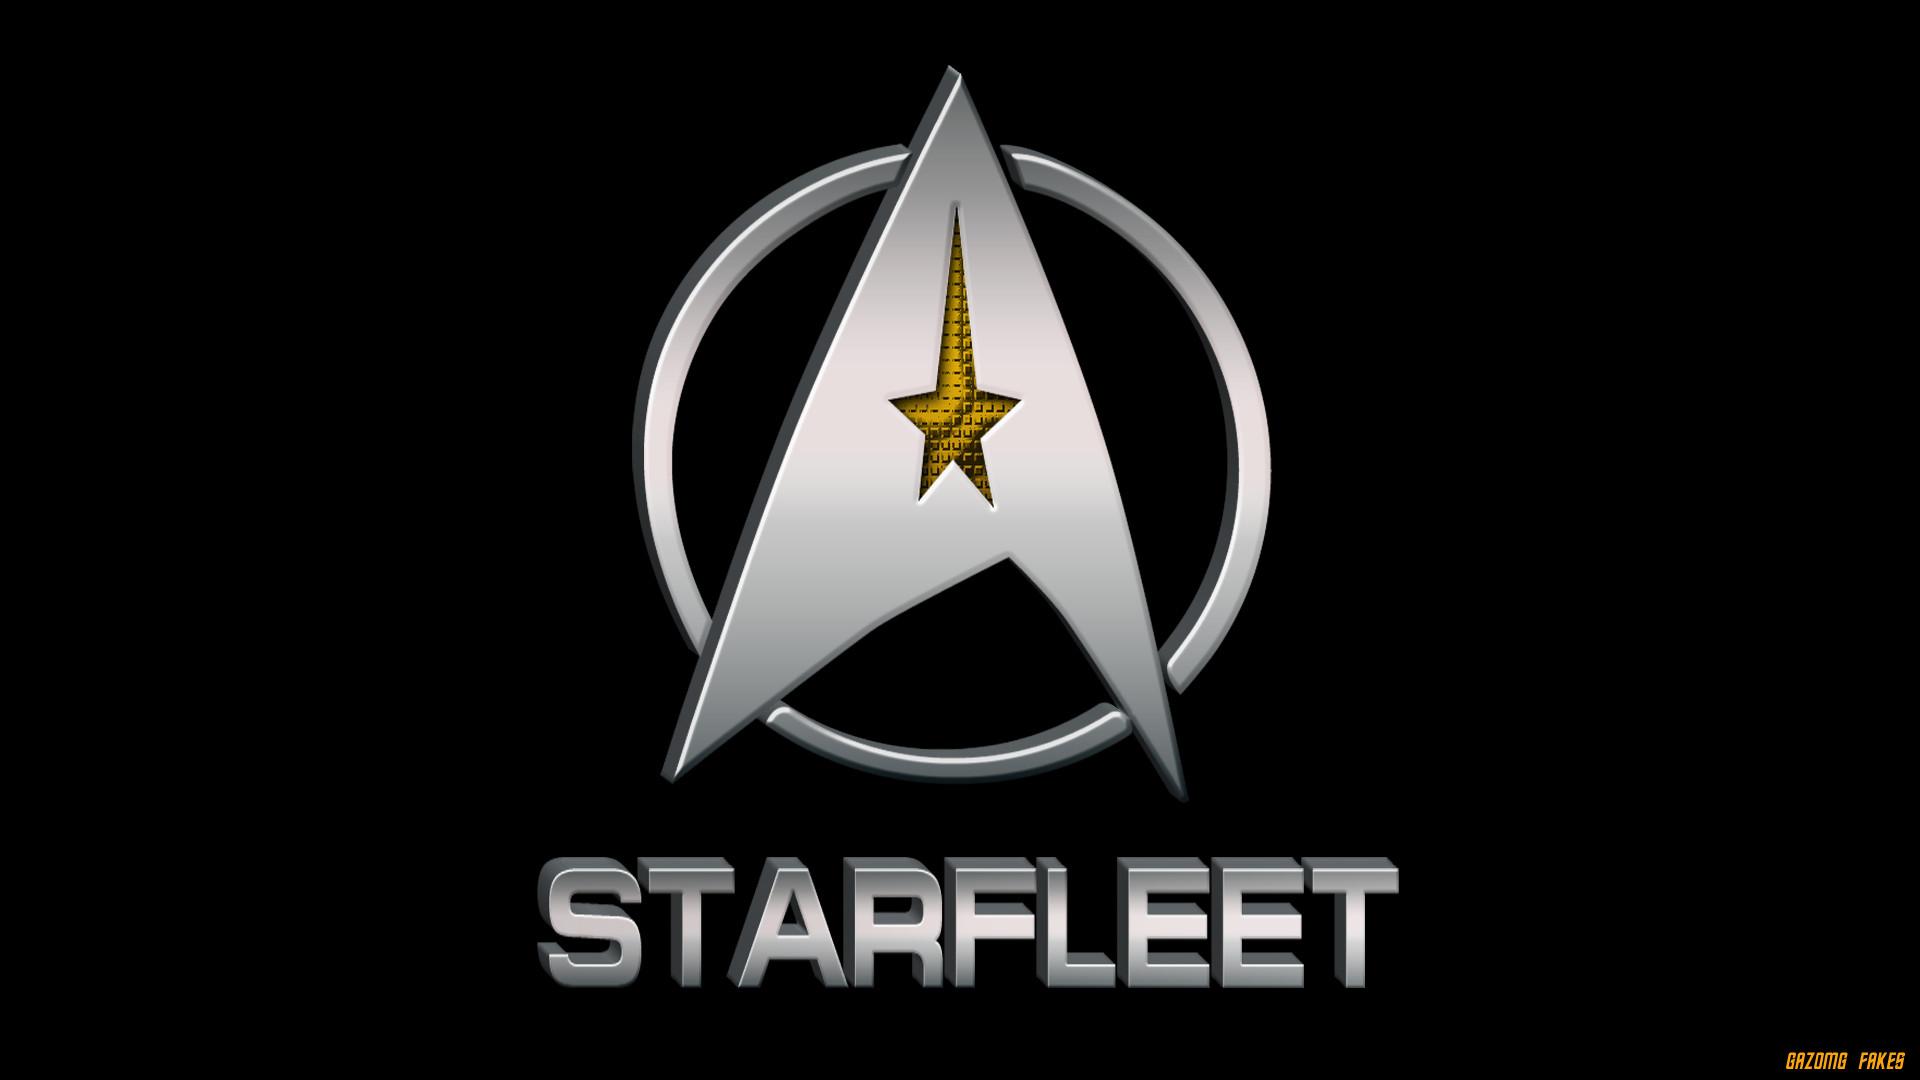 starfleet logo wallpaper 72 images